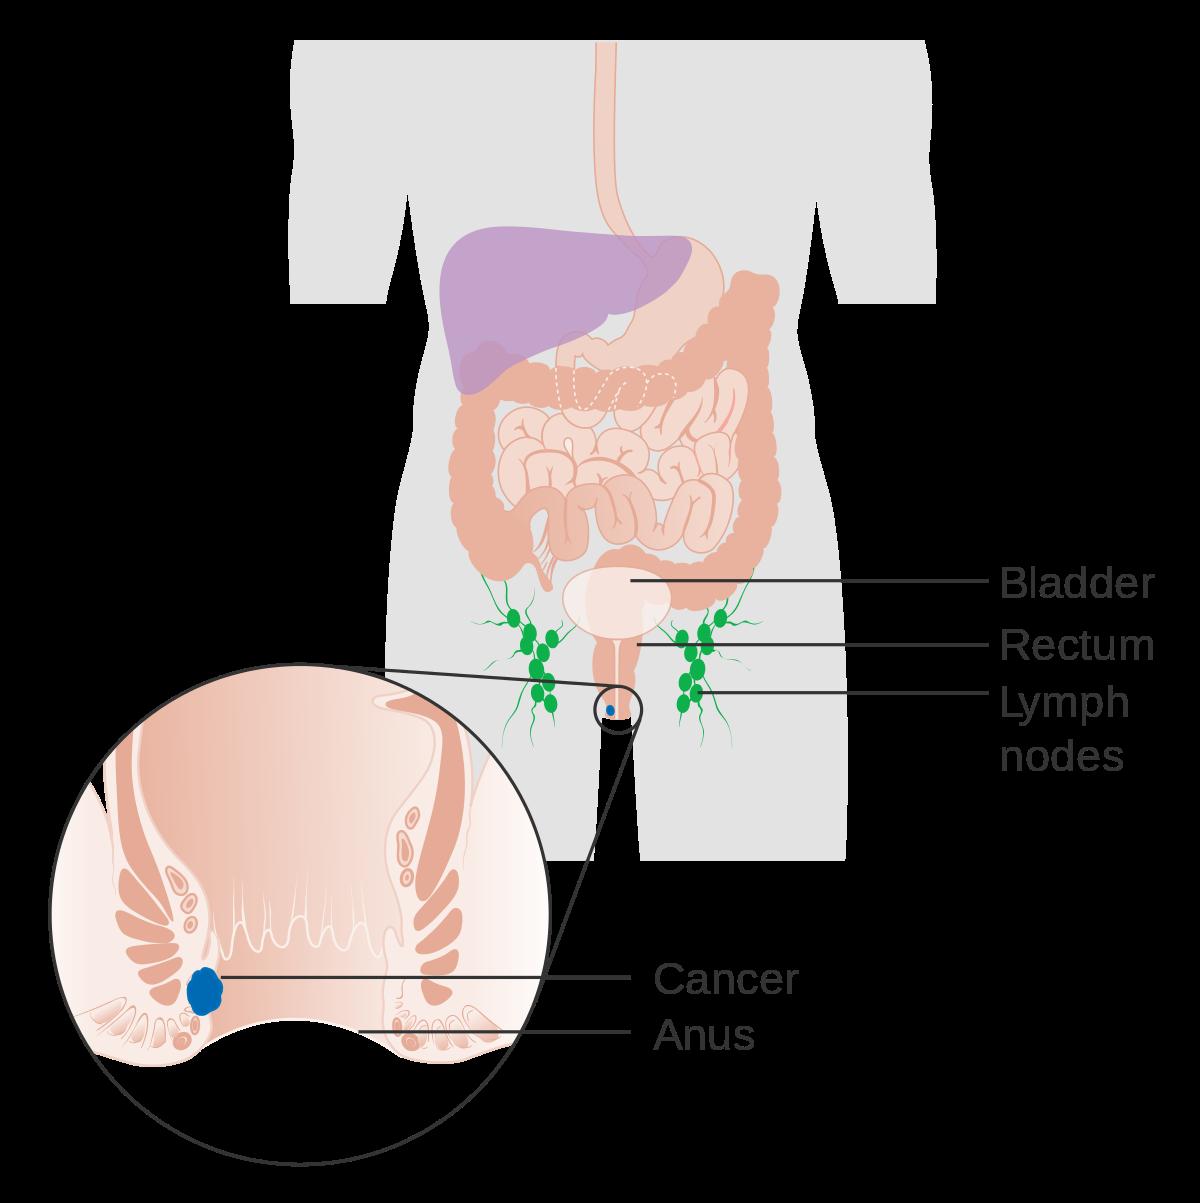 papilloma meaning in telugu)